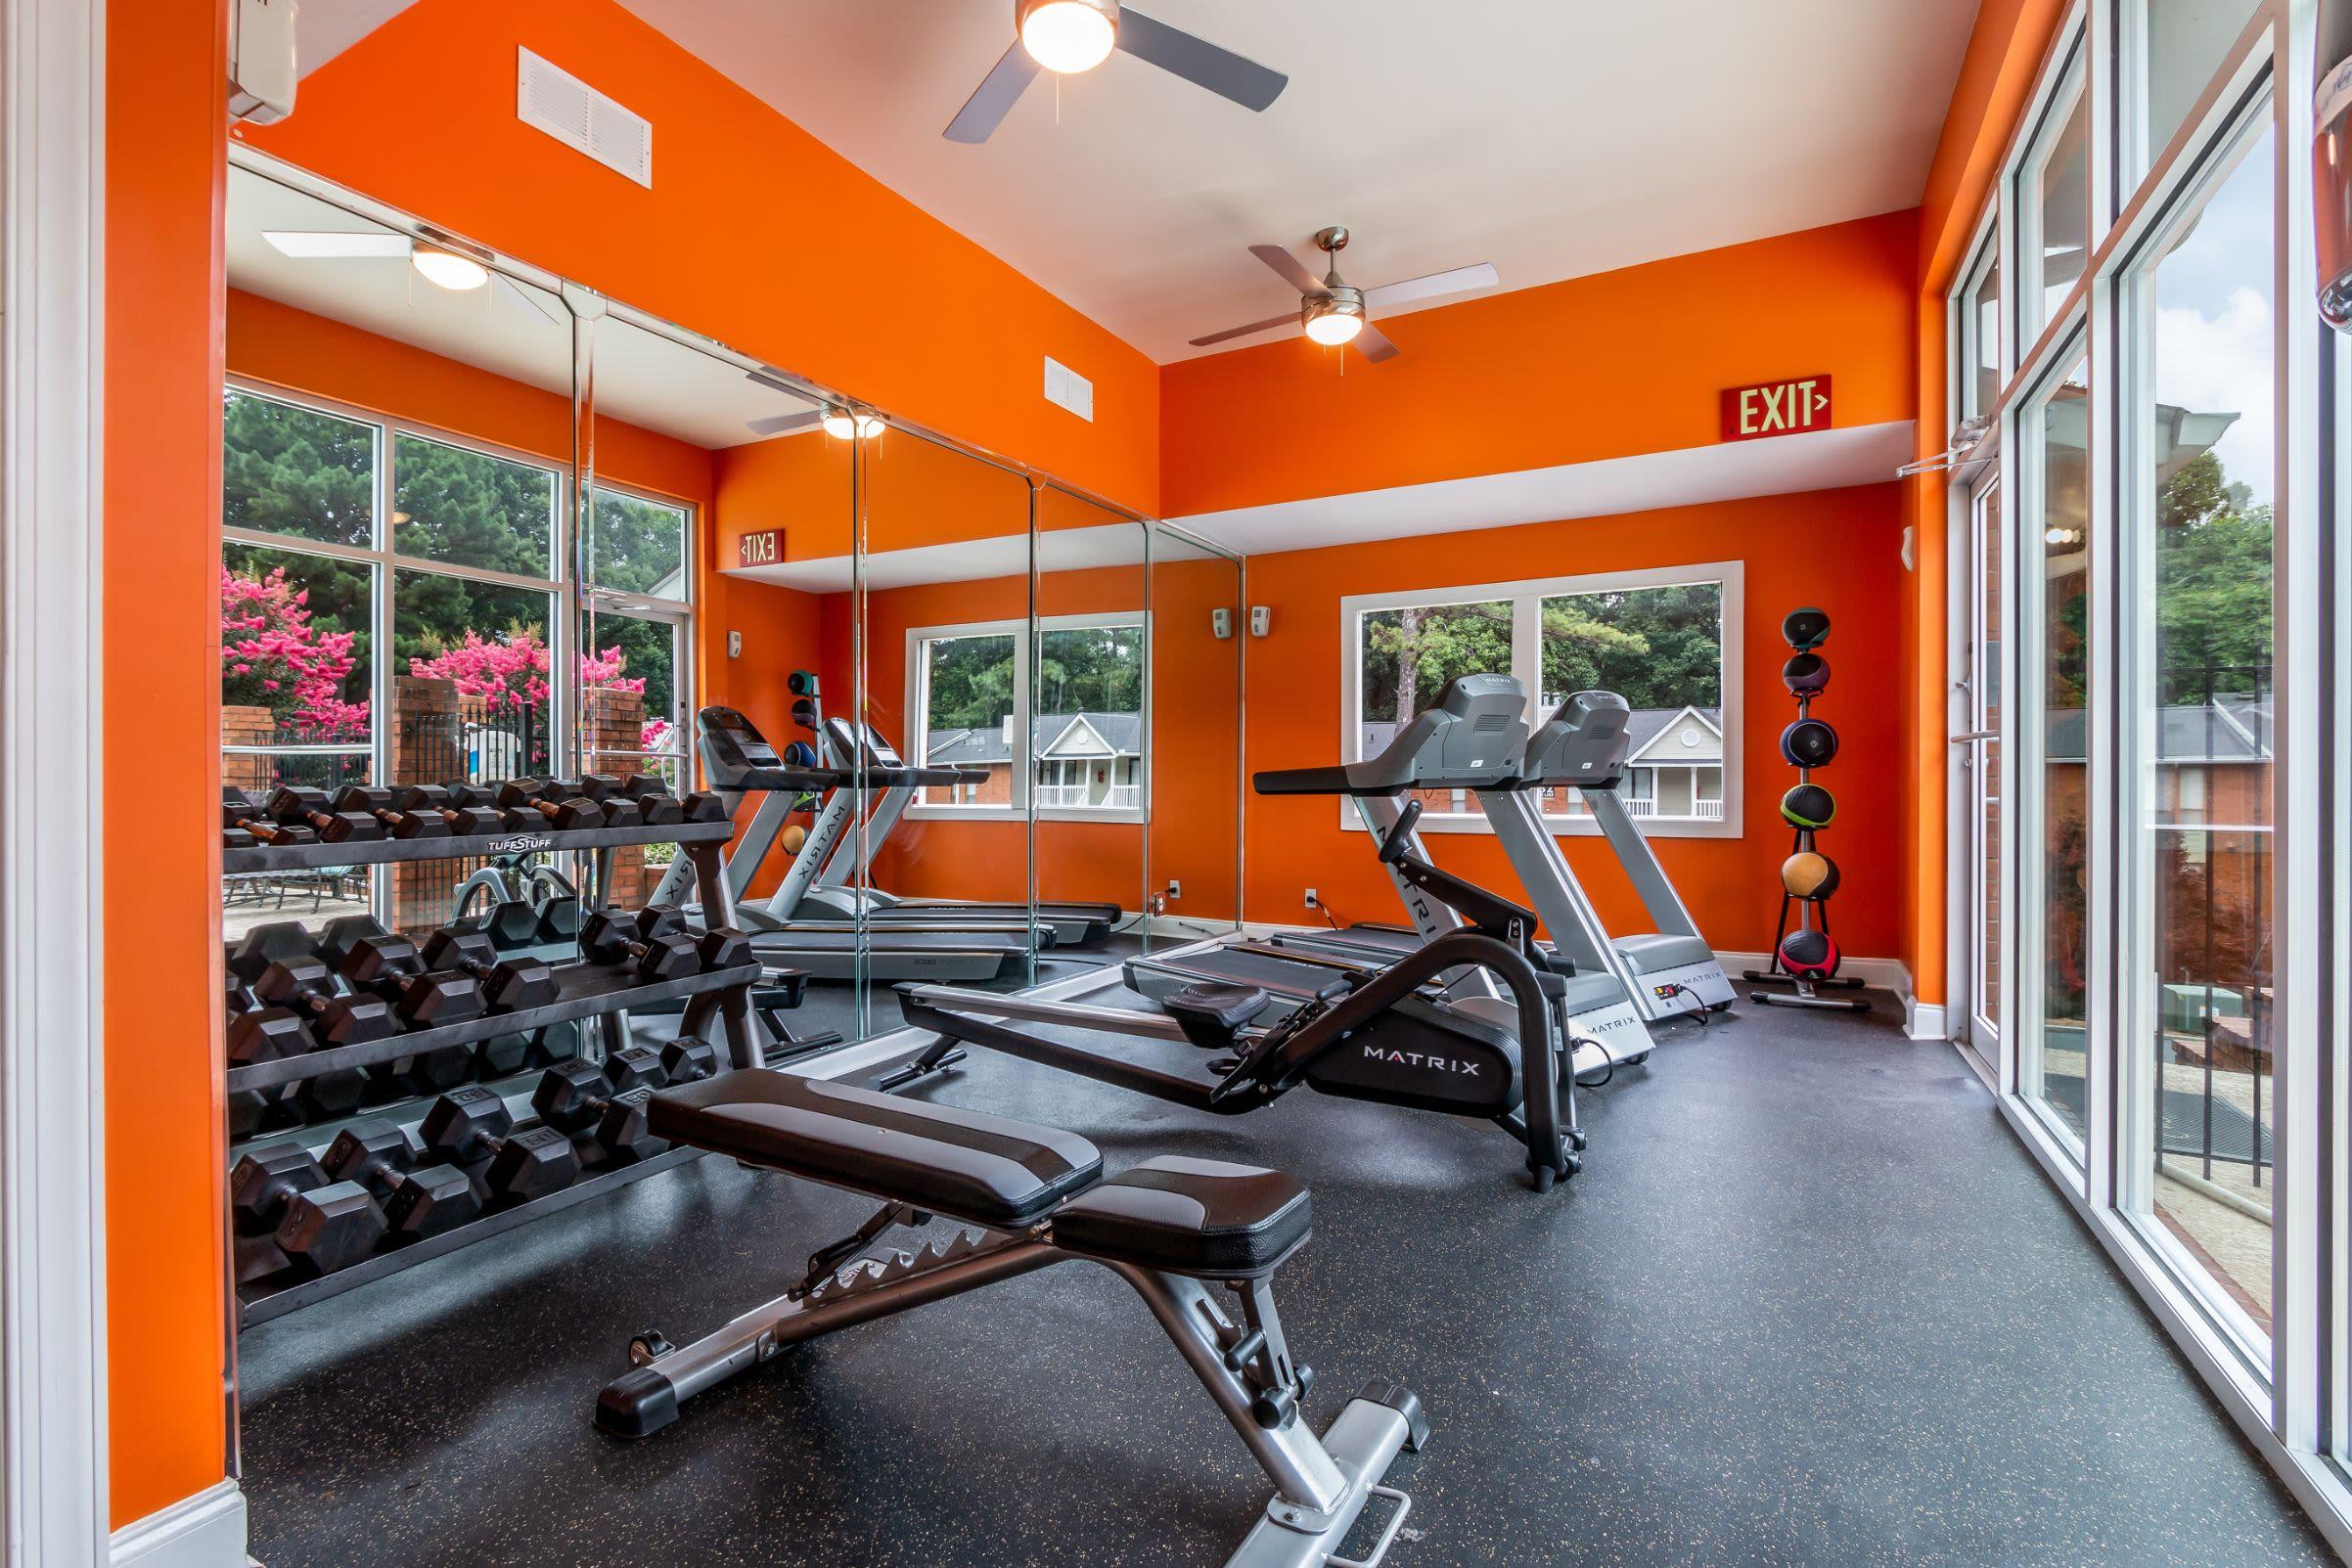 Free weights and cardio machines at Marquis at Perimeter Center in Atlanta, Georgia